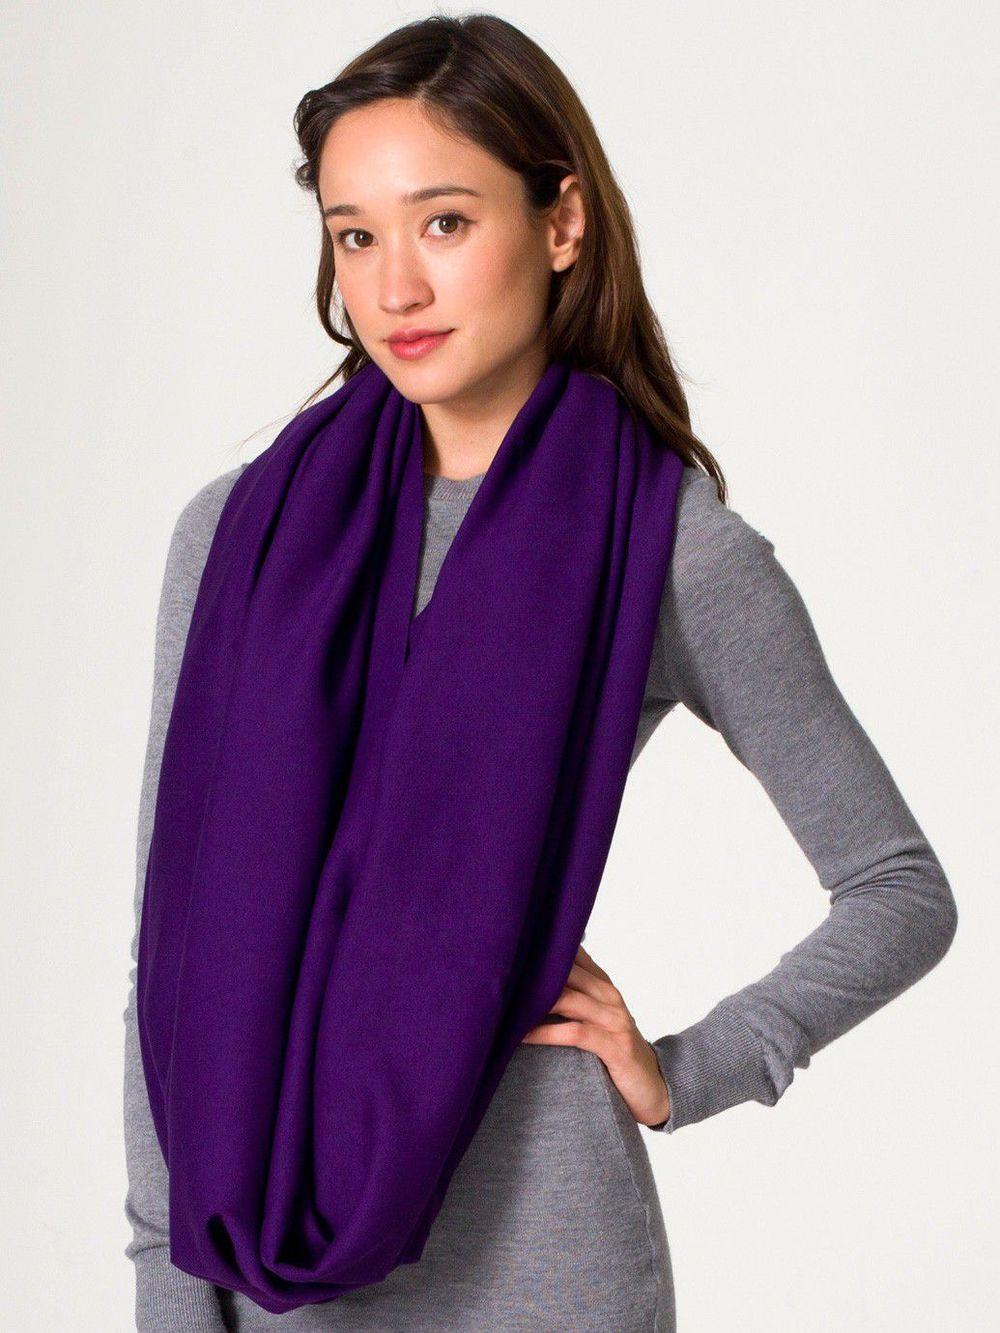 Circle scarf. American Apparel.